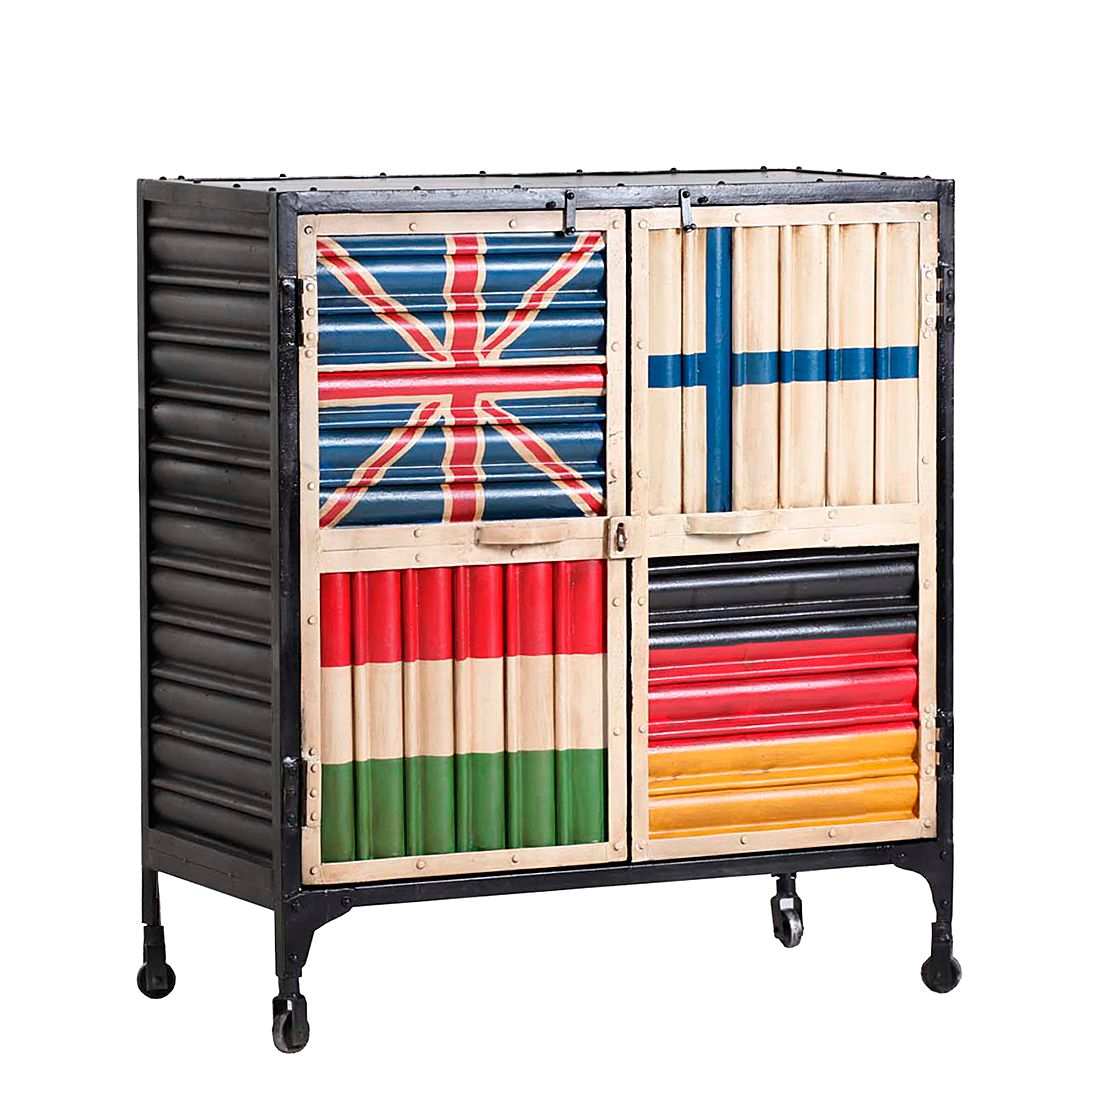 kommode bandera iii eisen furnlab g nstig kaufen. Black Bedroom Furniture Sets. Home Design Ideas